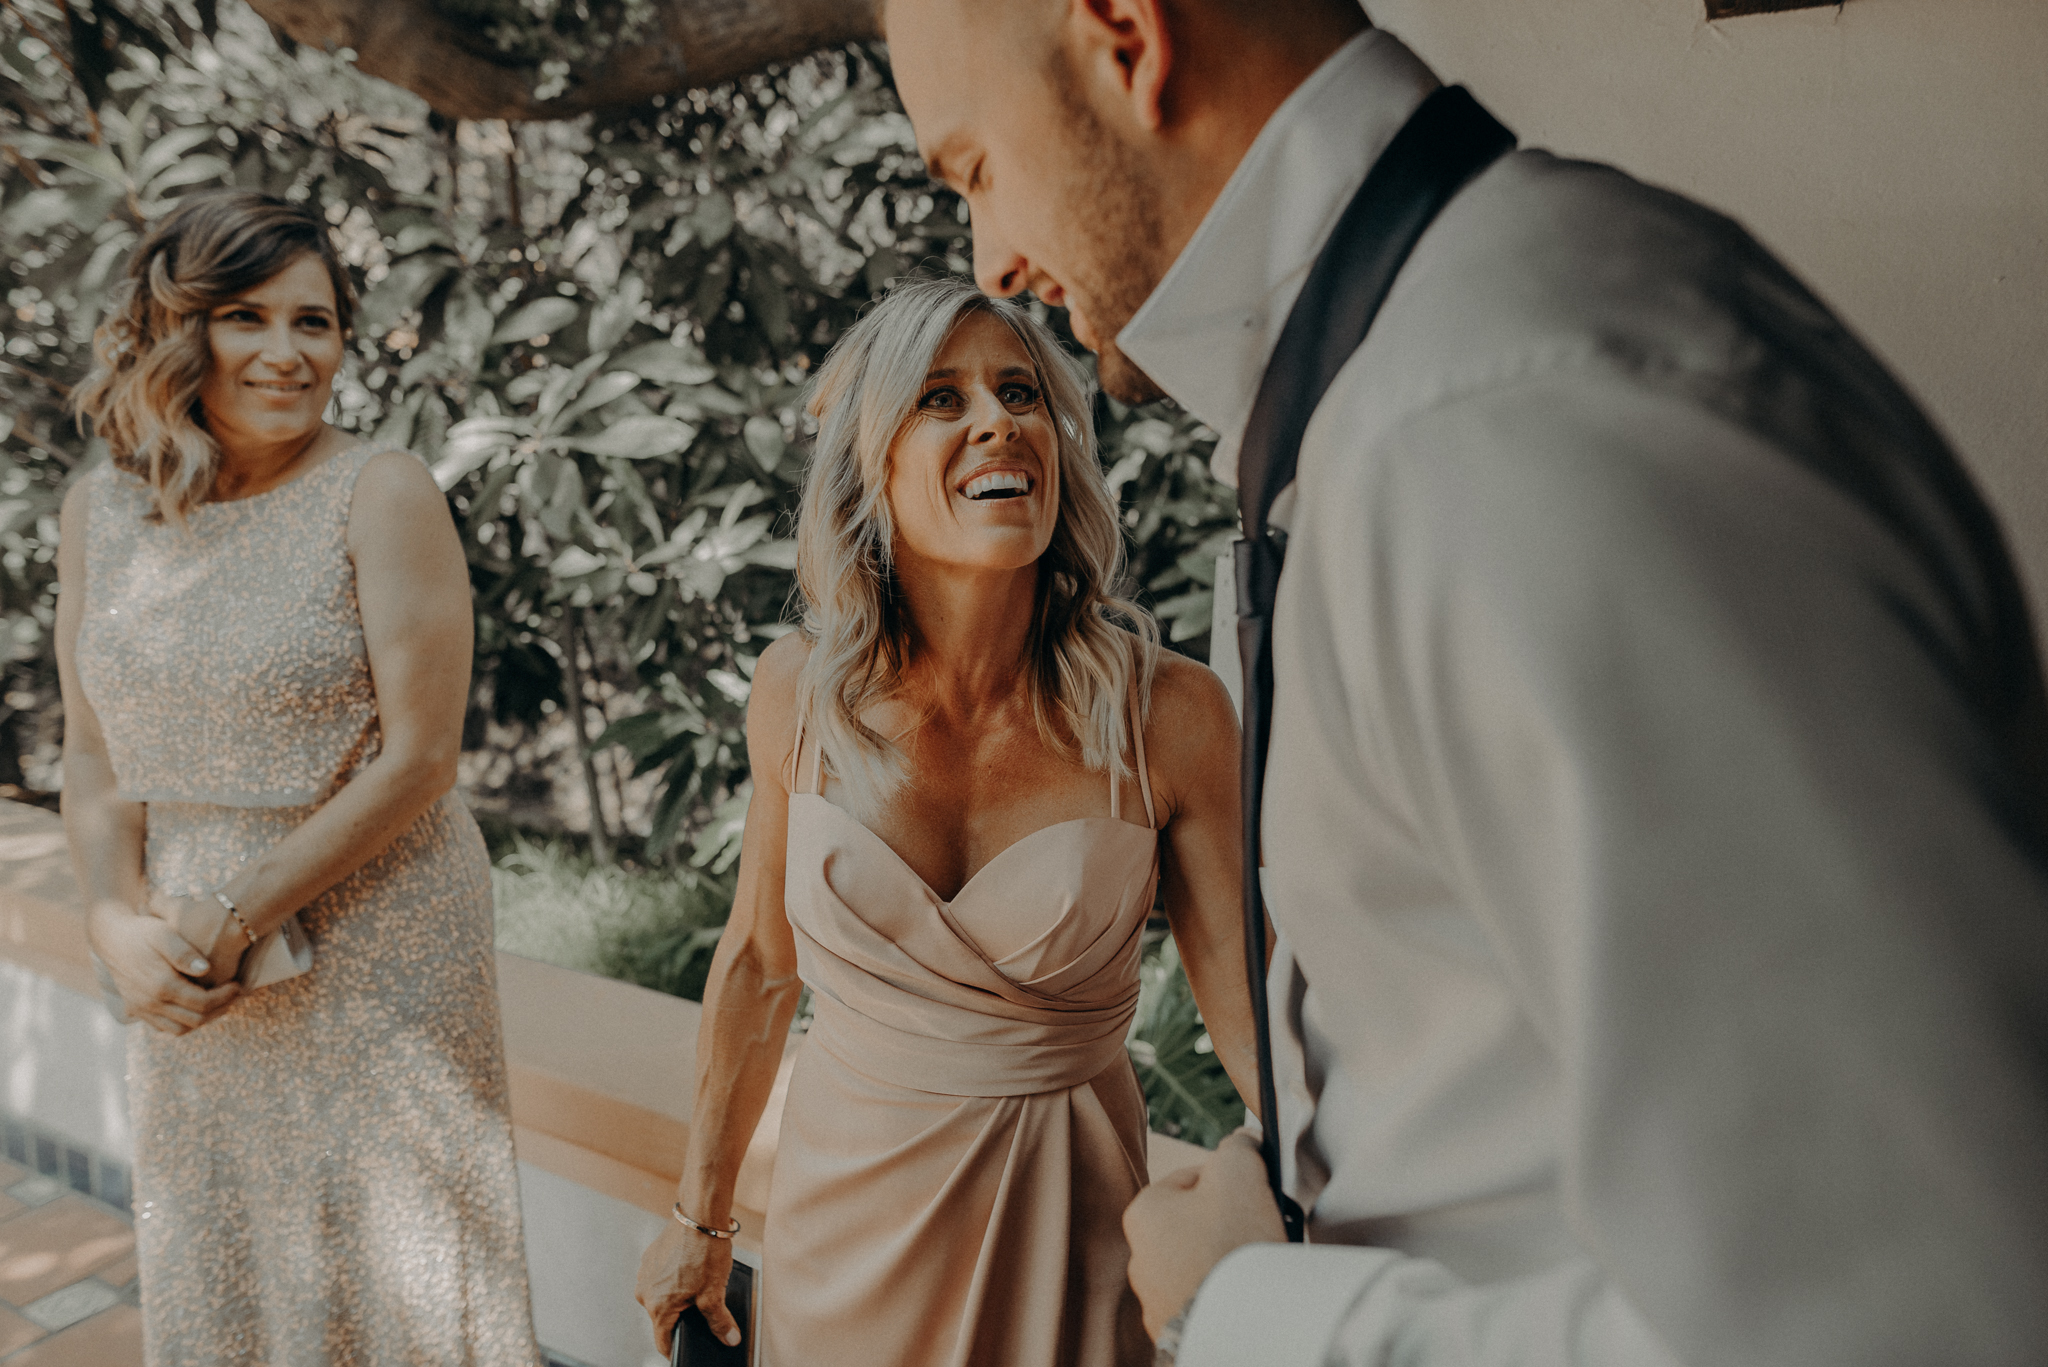 Isaiah + Taylor Photography - Rancho Las Lomas Wedding, Los Angeles Wedding Photographer-018.jpg